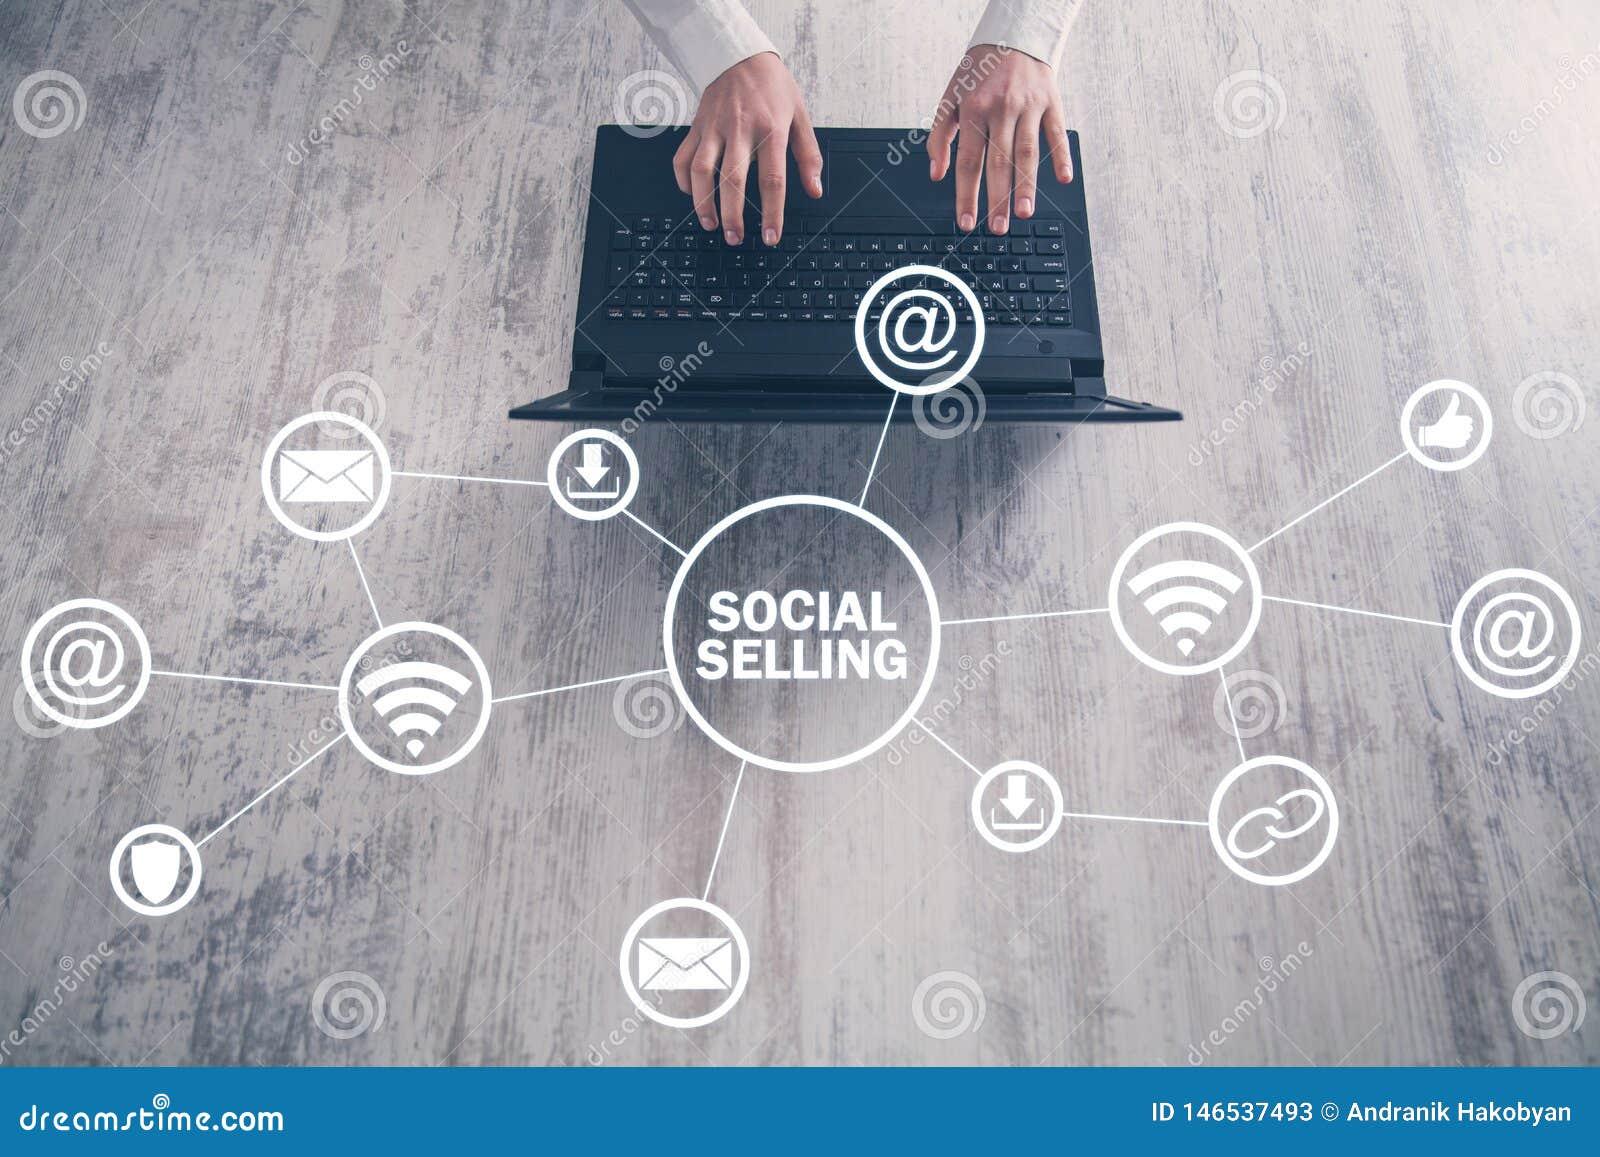 Internet, mededeling, technologie Concept het sociale verkopen